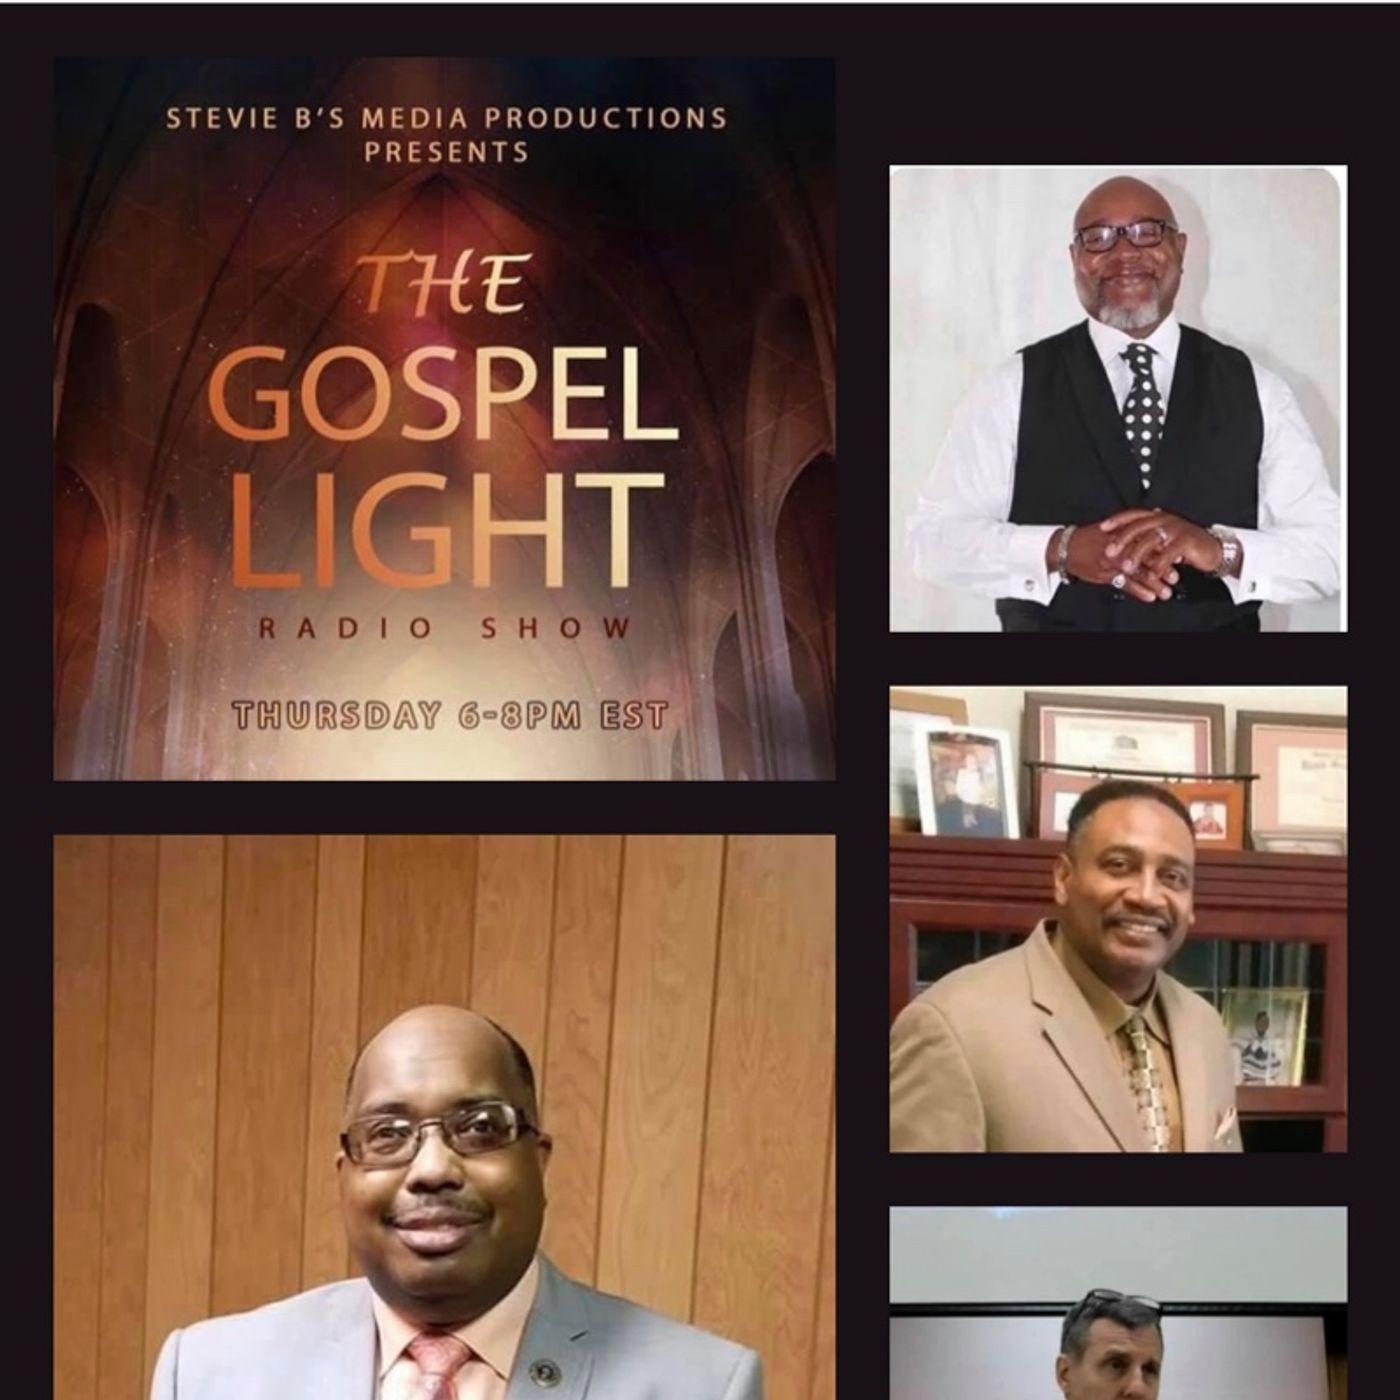 The Gospel Light Radio Show (Episode 237)